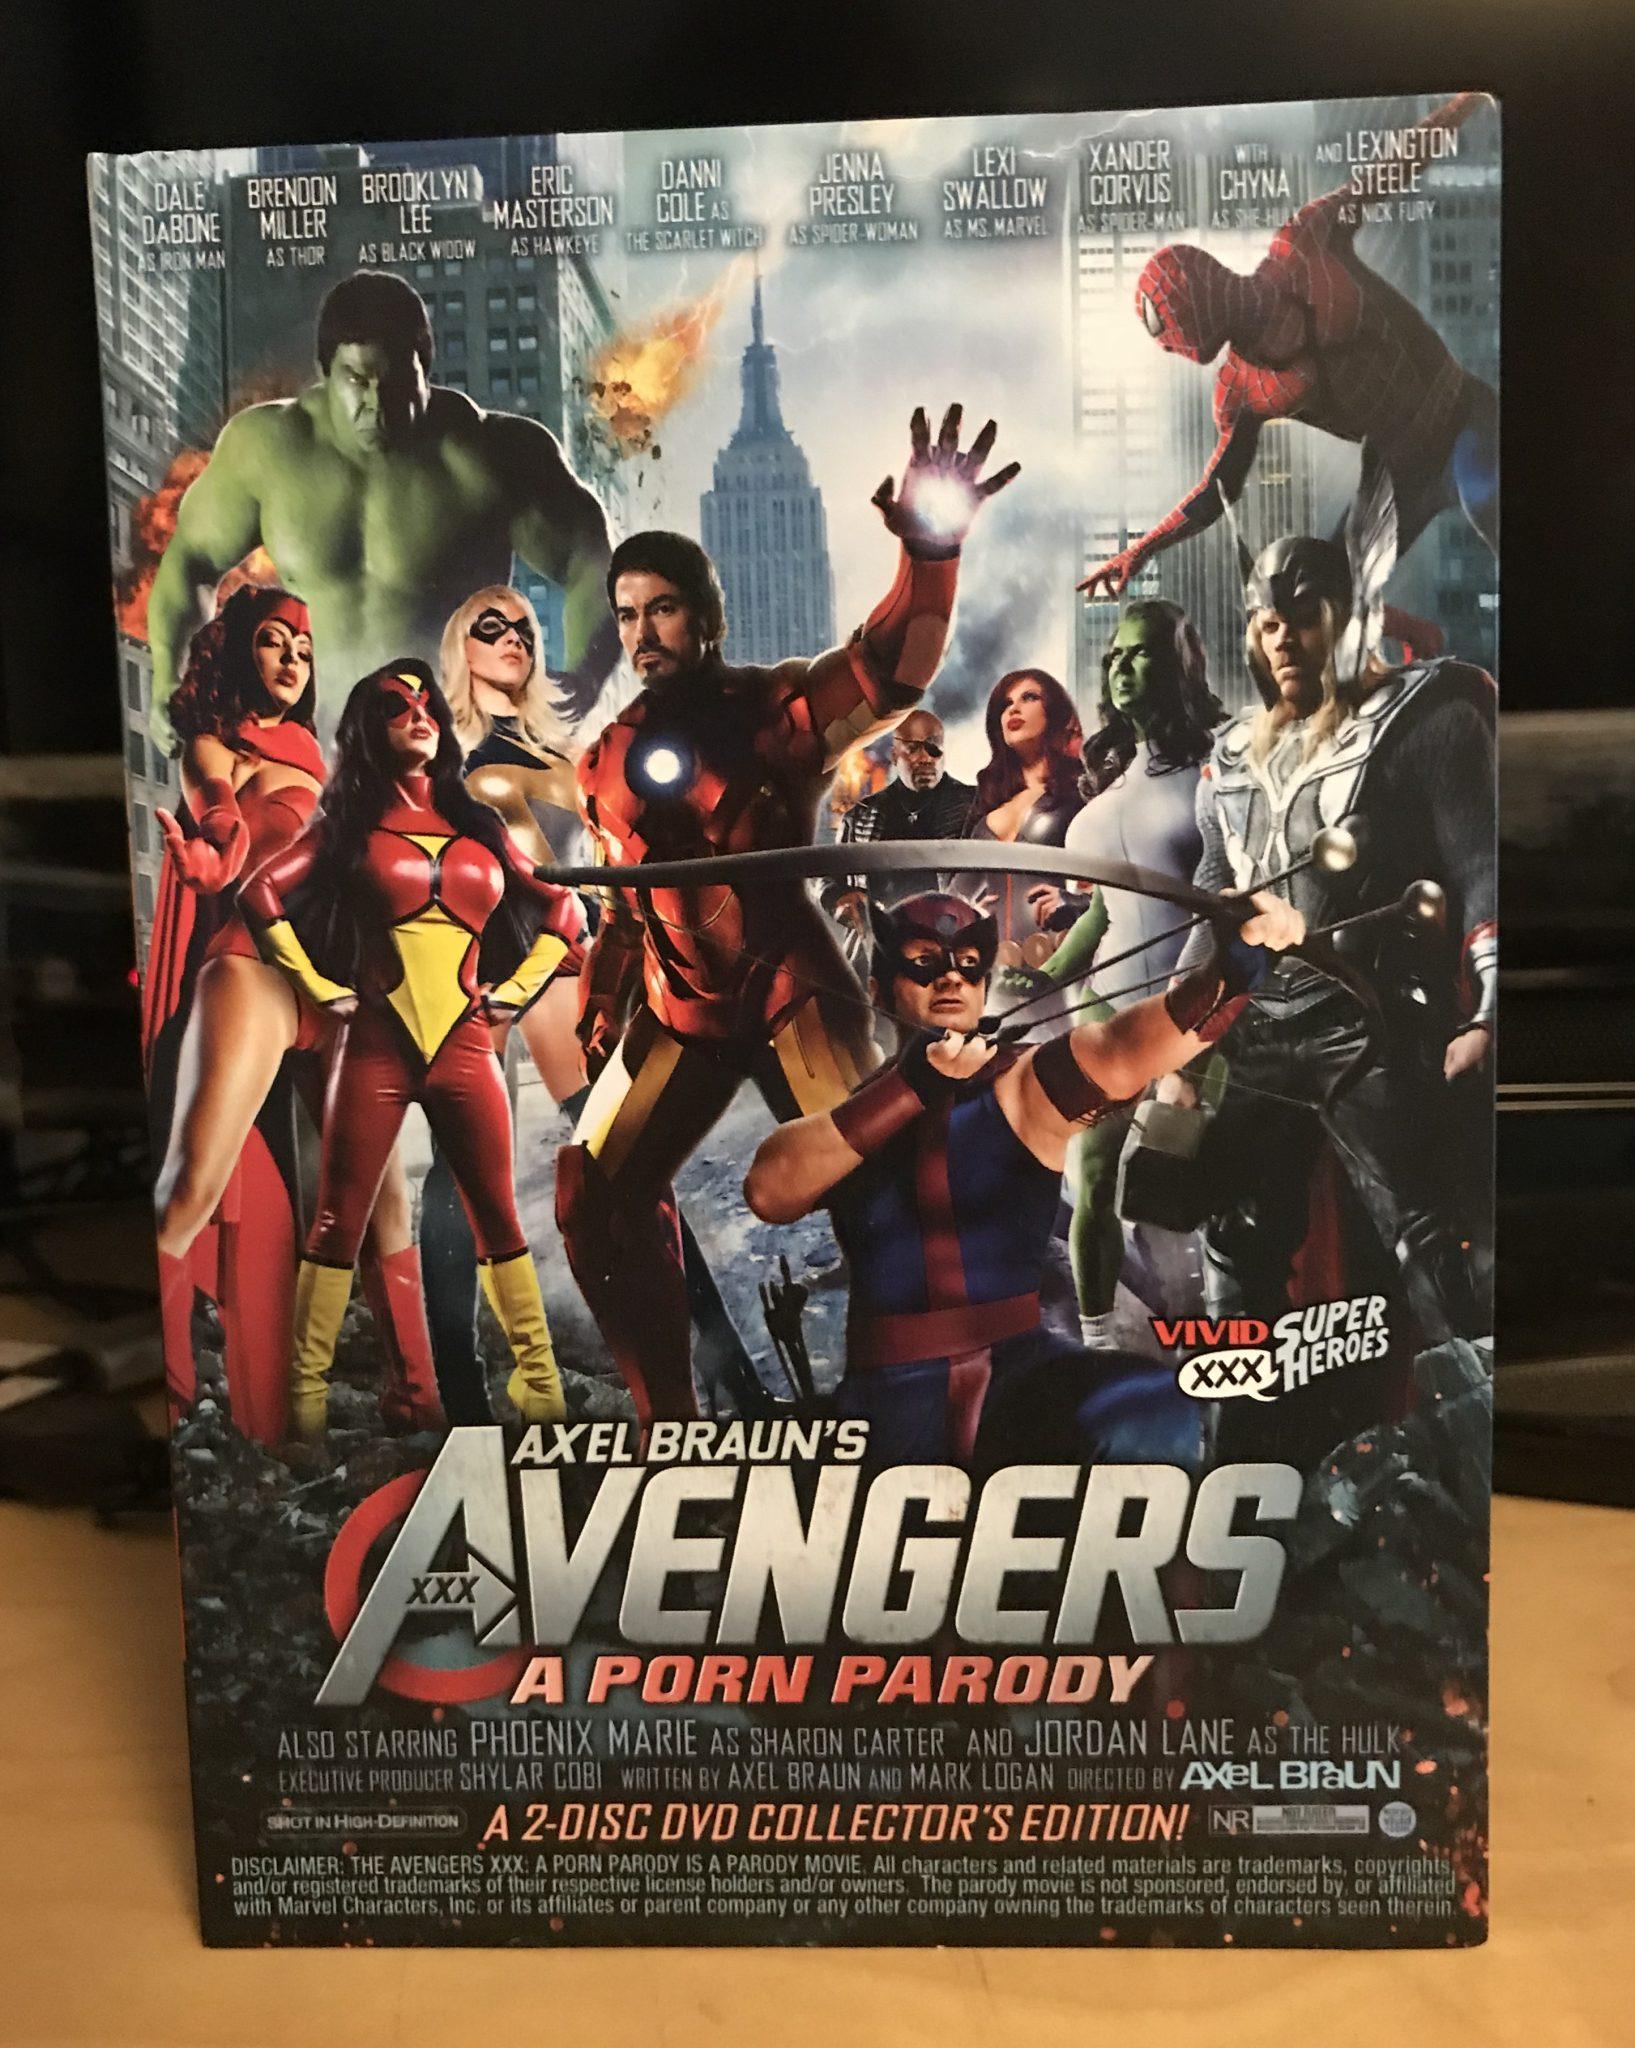 Parody porn avengers pics xxx